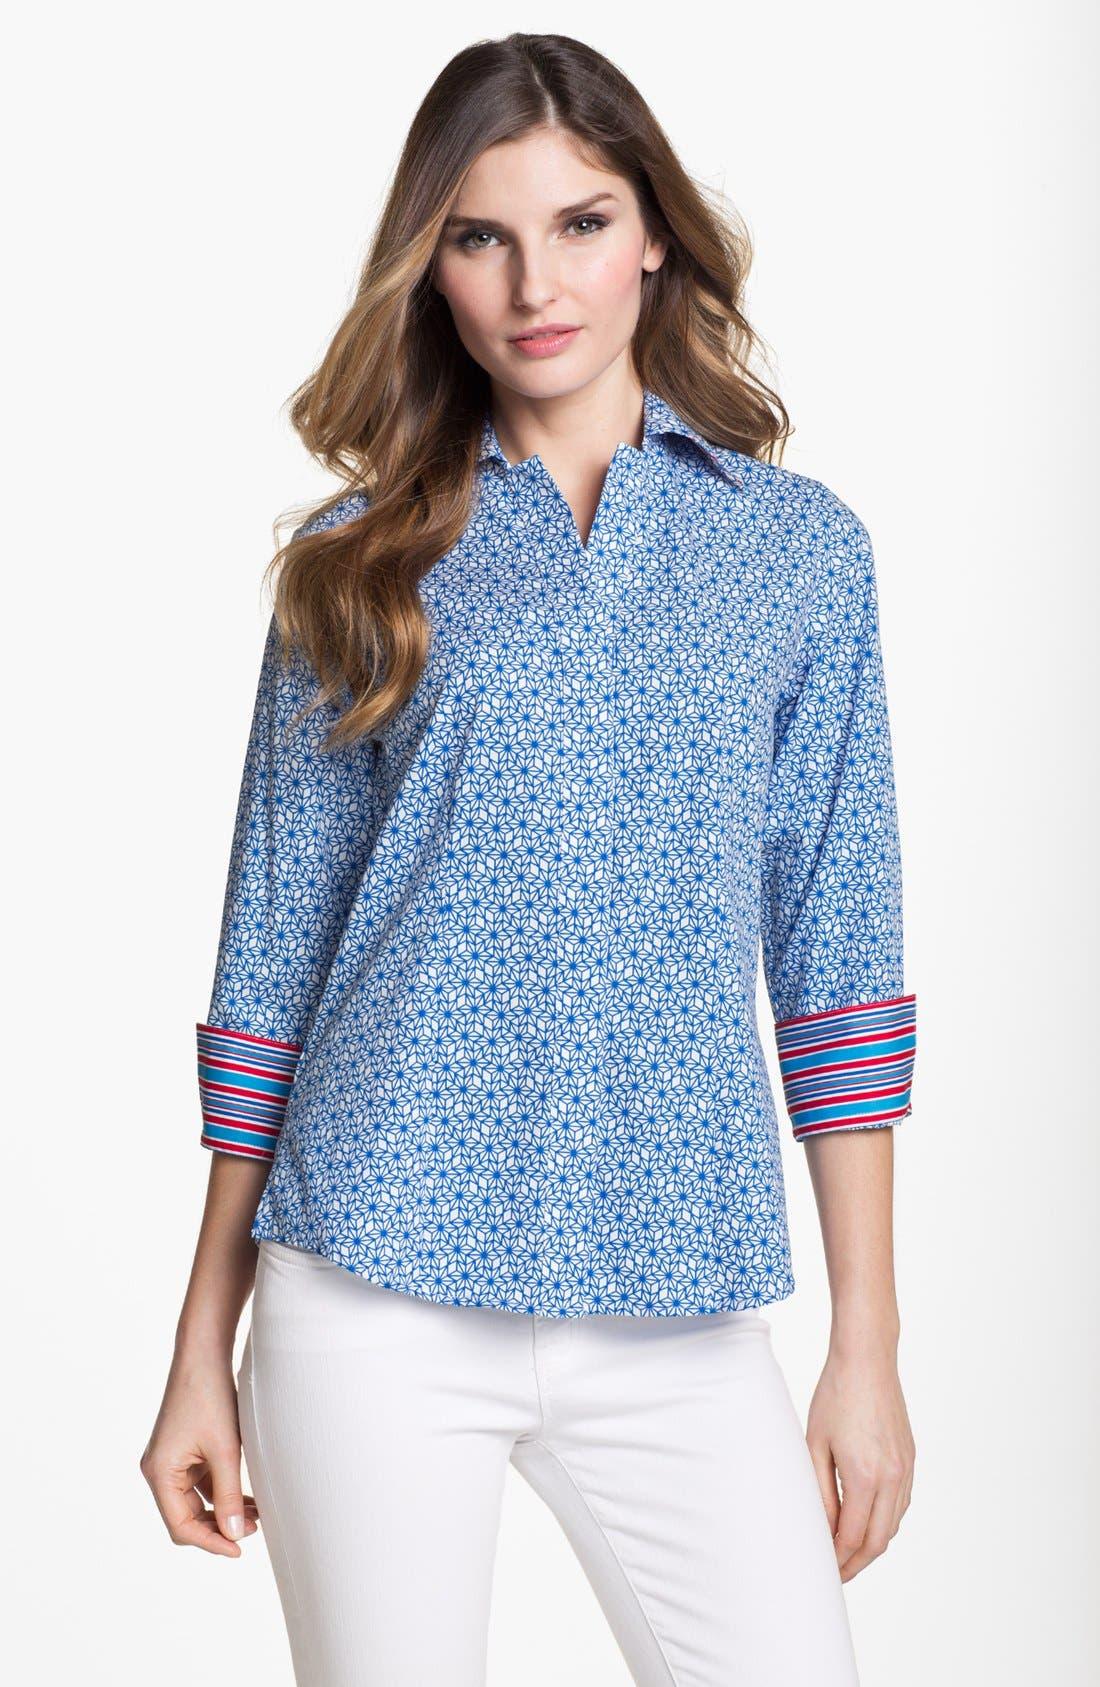 Main Image - Foxcroft 'Stars and Stripes' Shaped Shirt